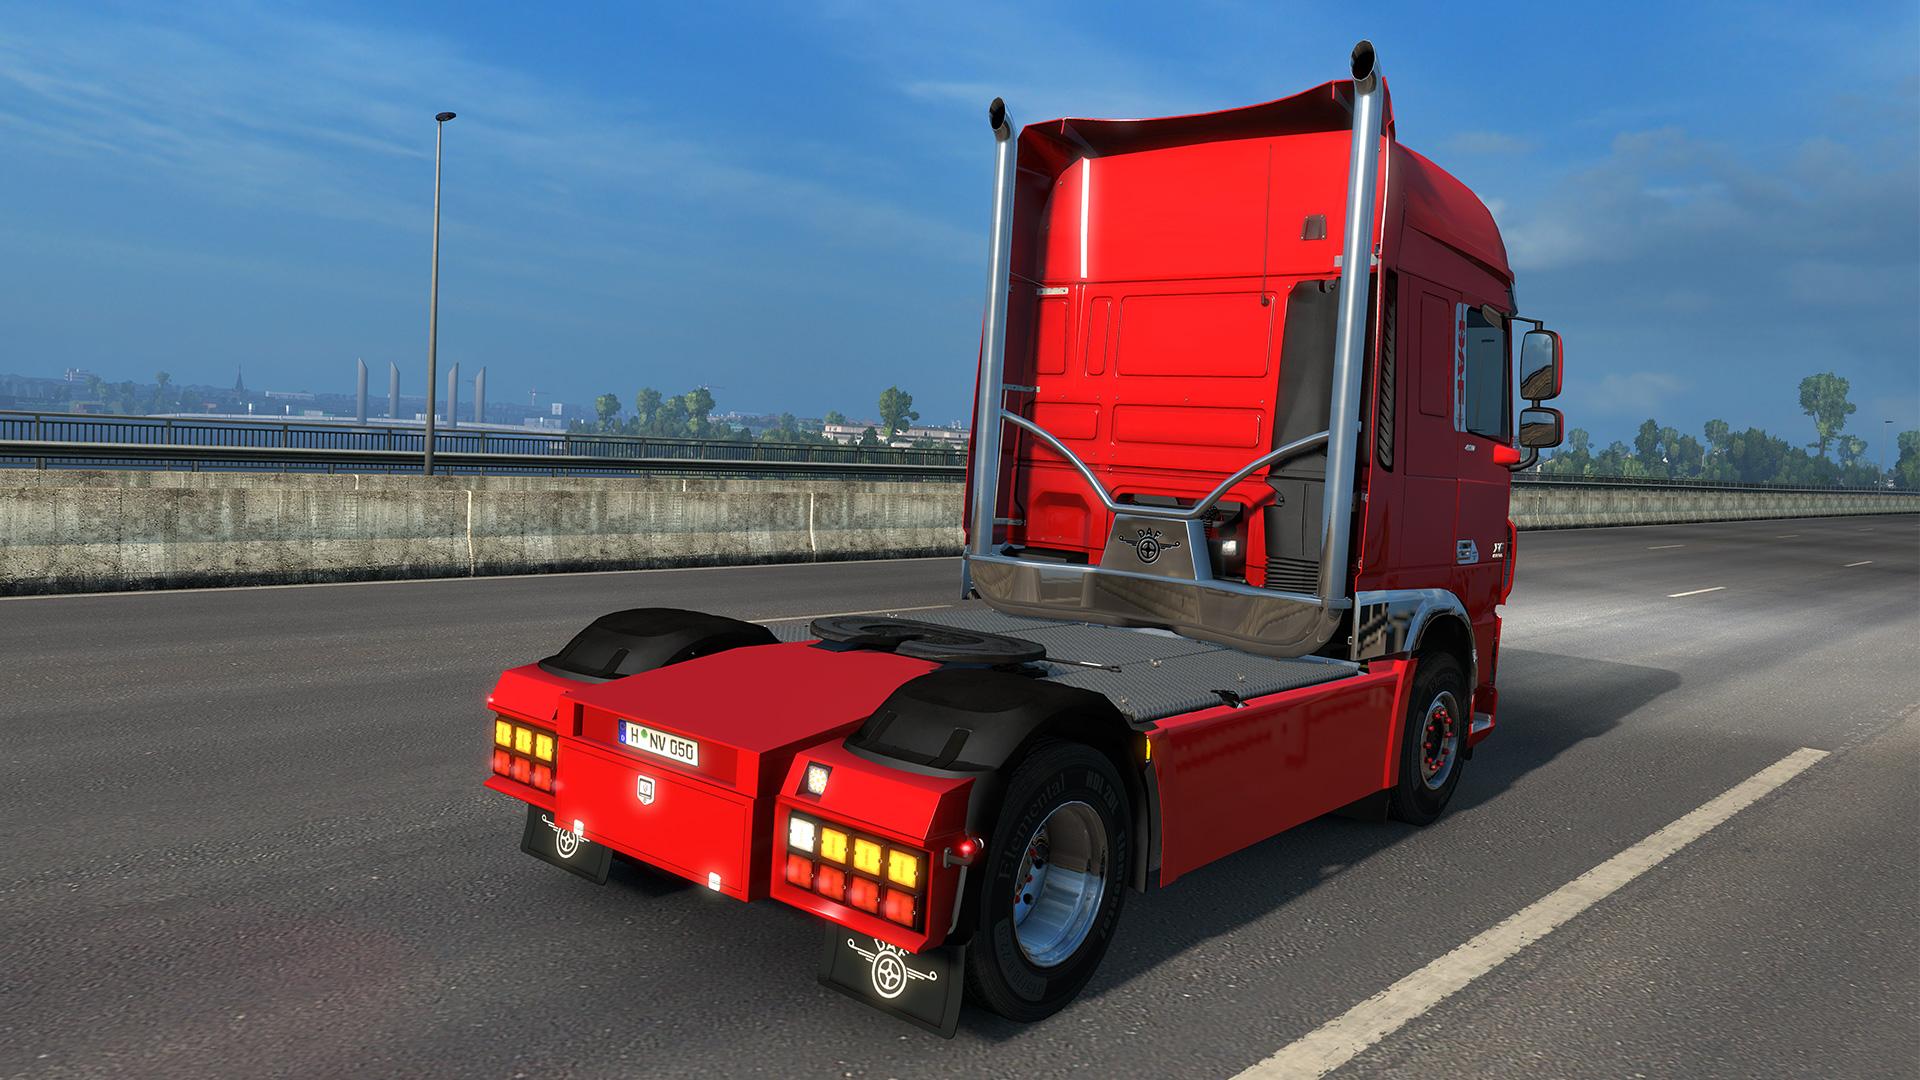 Euro truck simulator 2 - xf tuning pack cracked